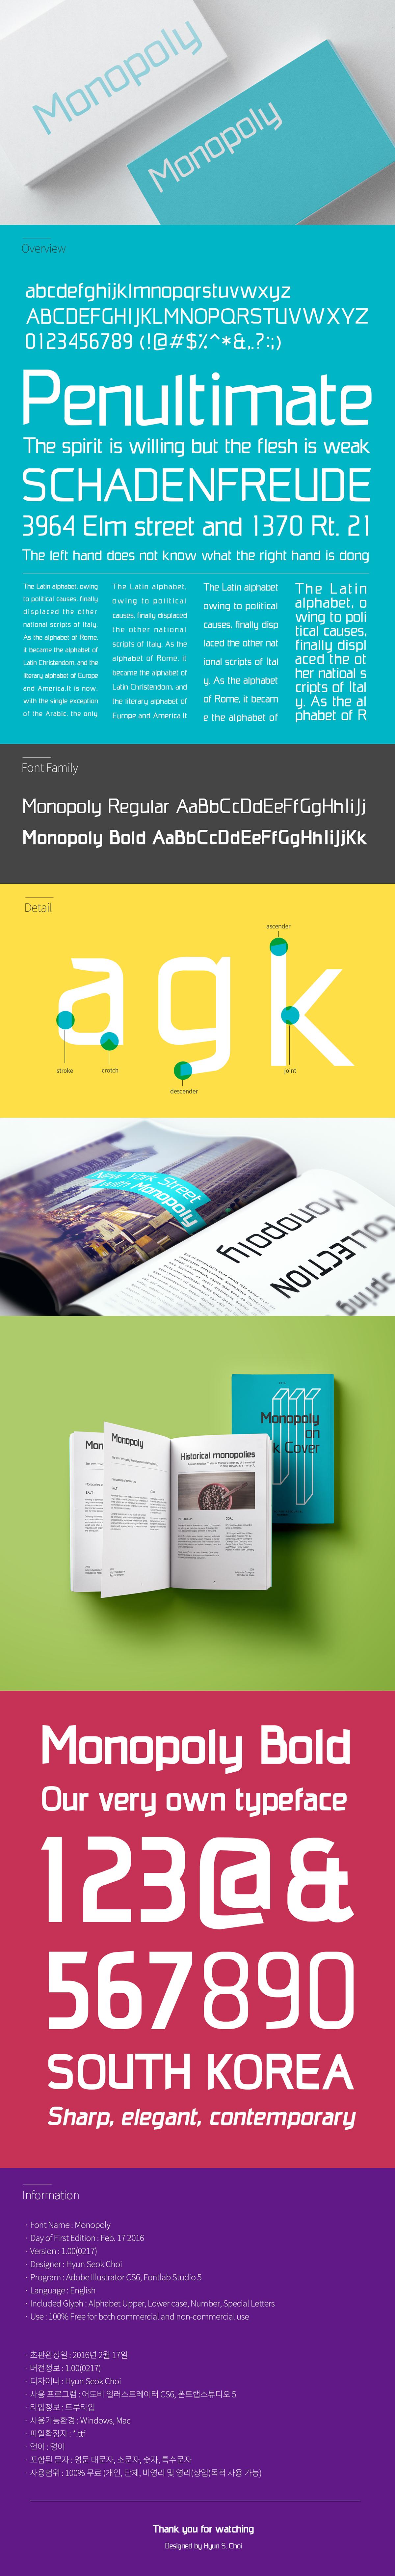 san serif,commercial use font,Free font,font,100% free font